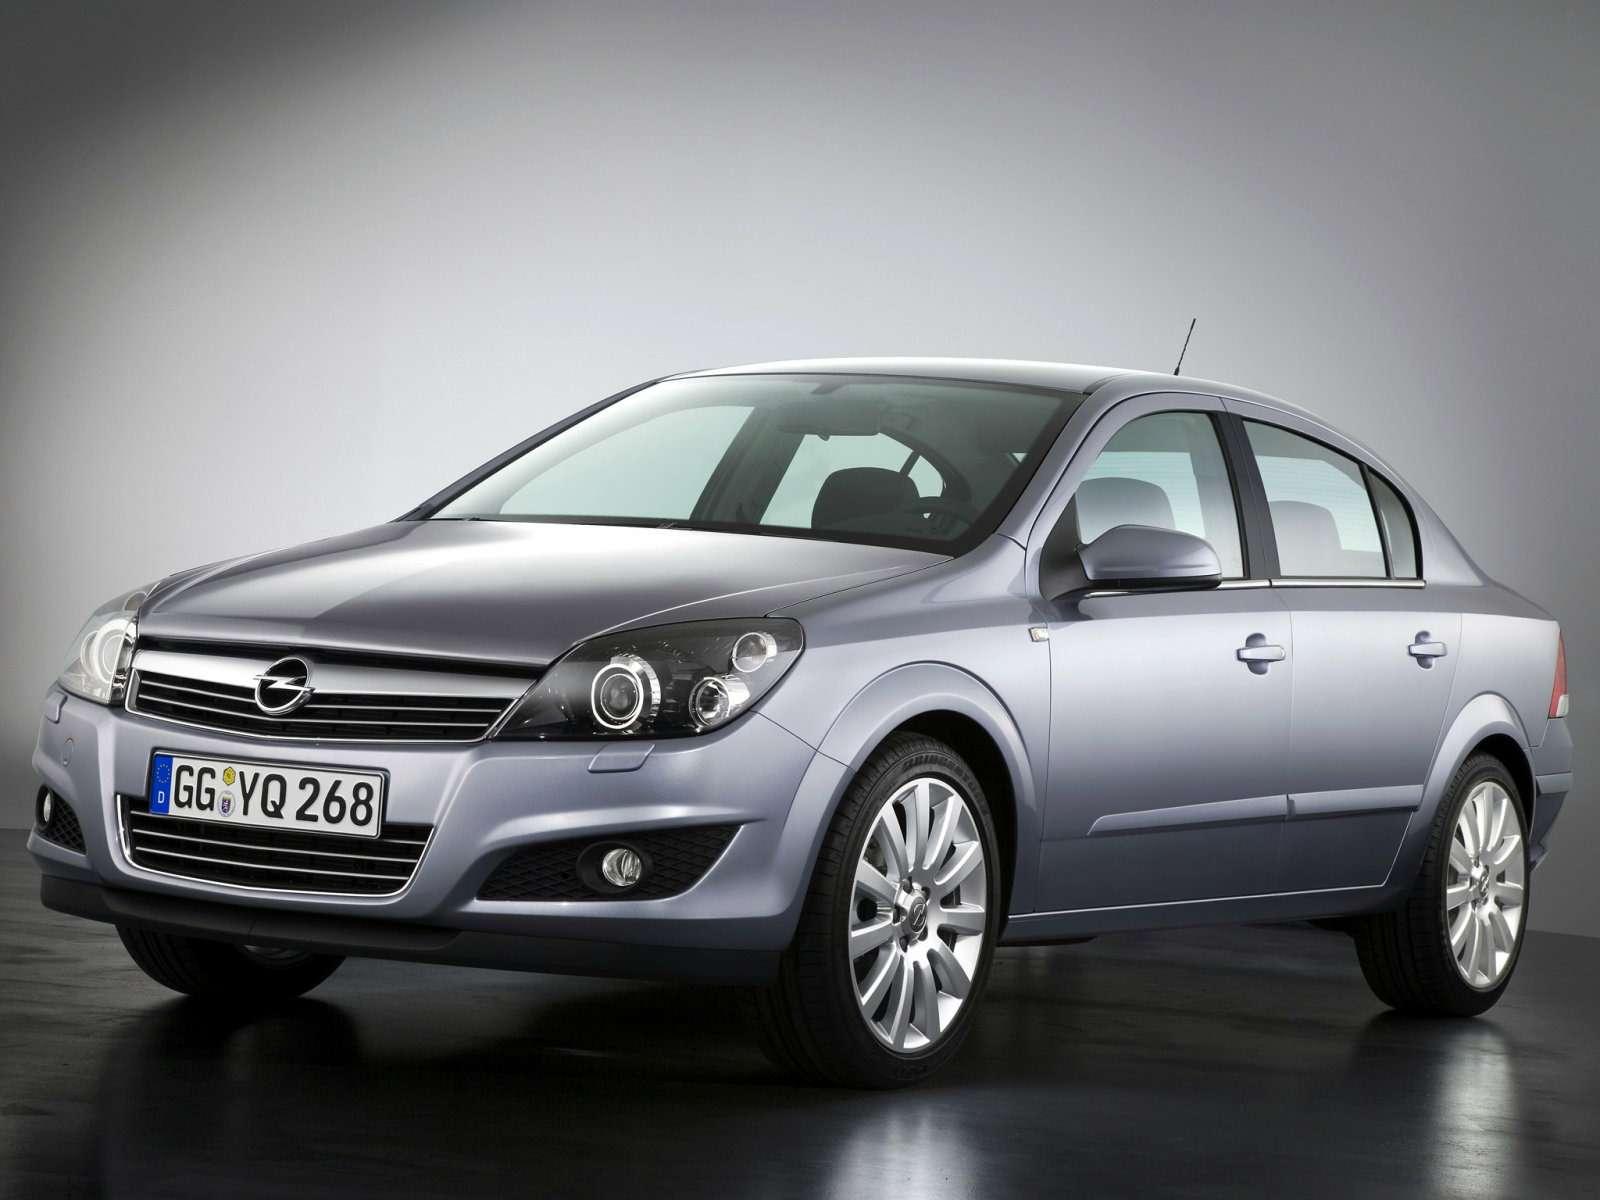 Opel_Astra_Sedan_2007